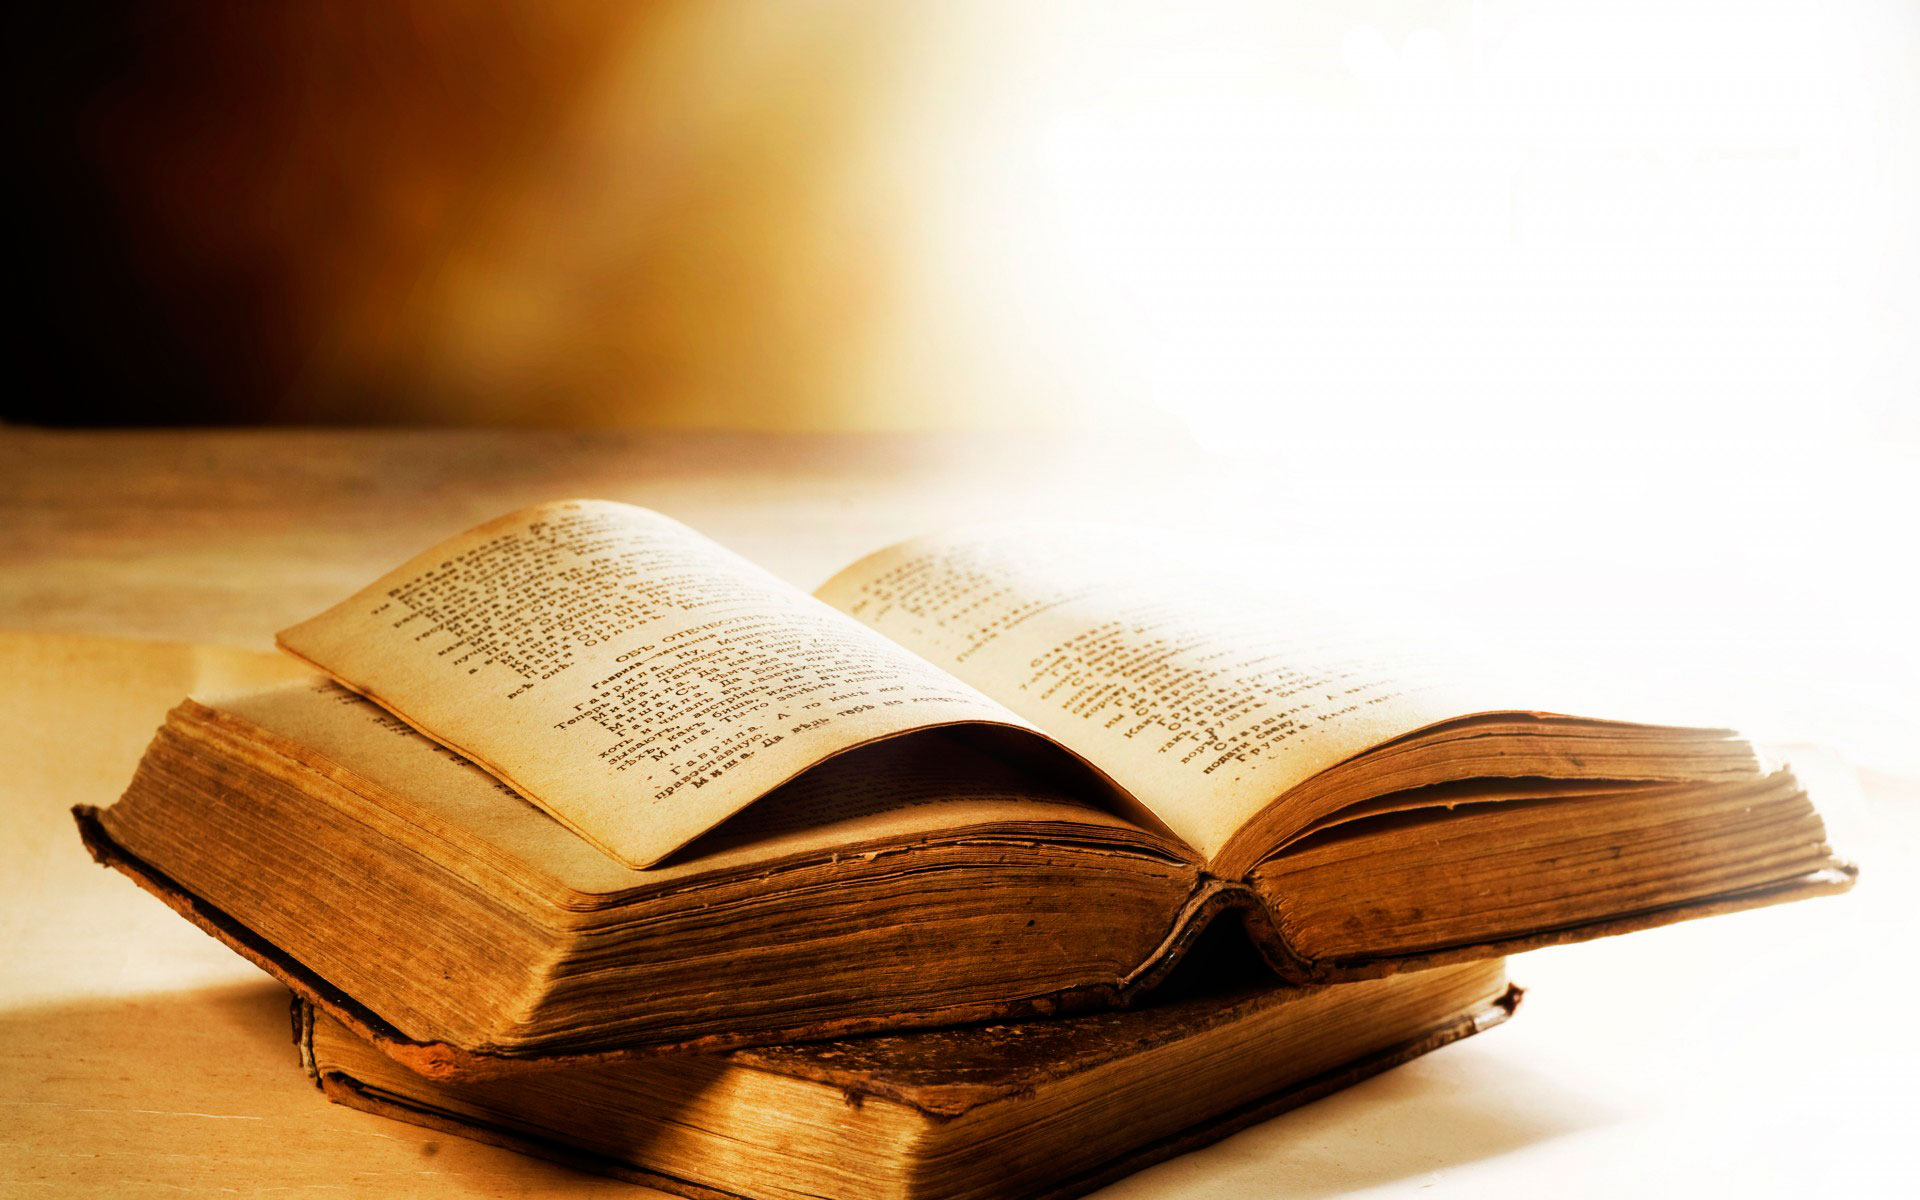 23 април – Ден на книгата и авторското право